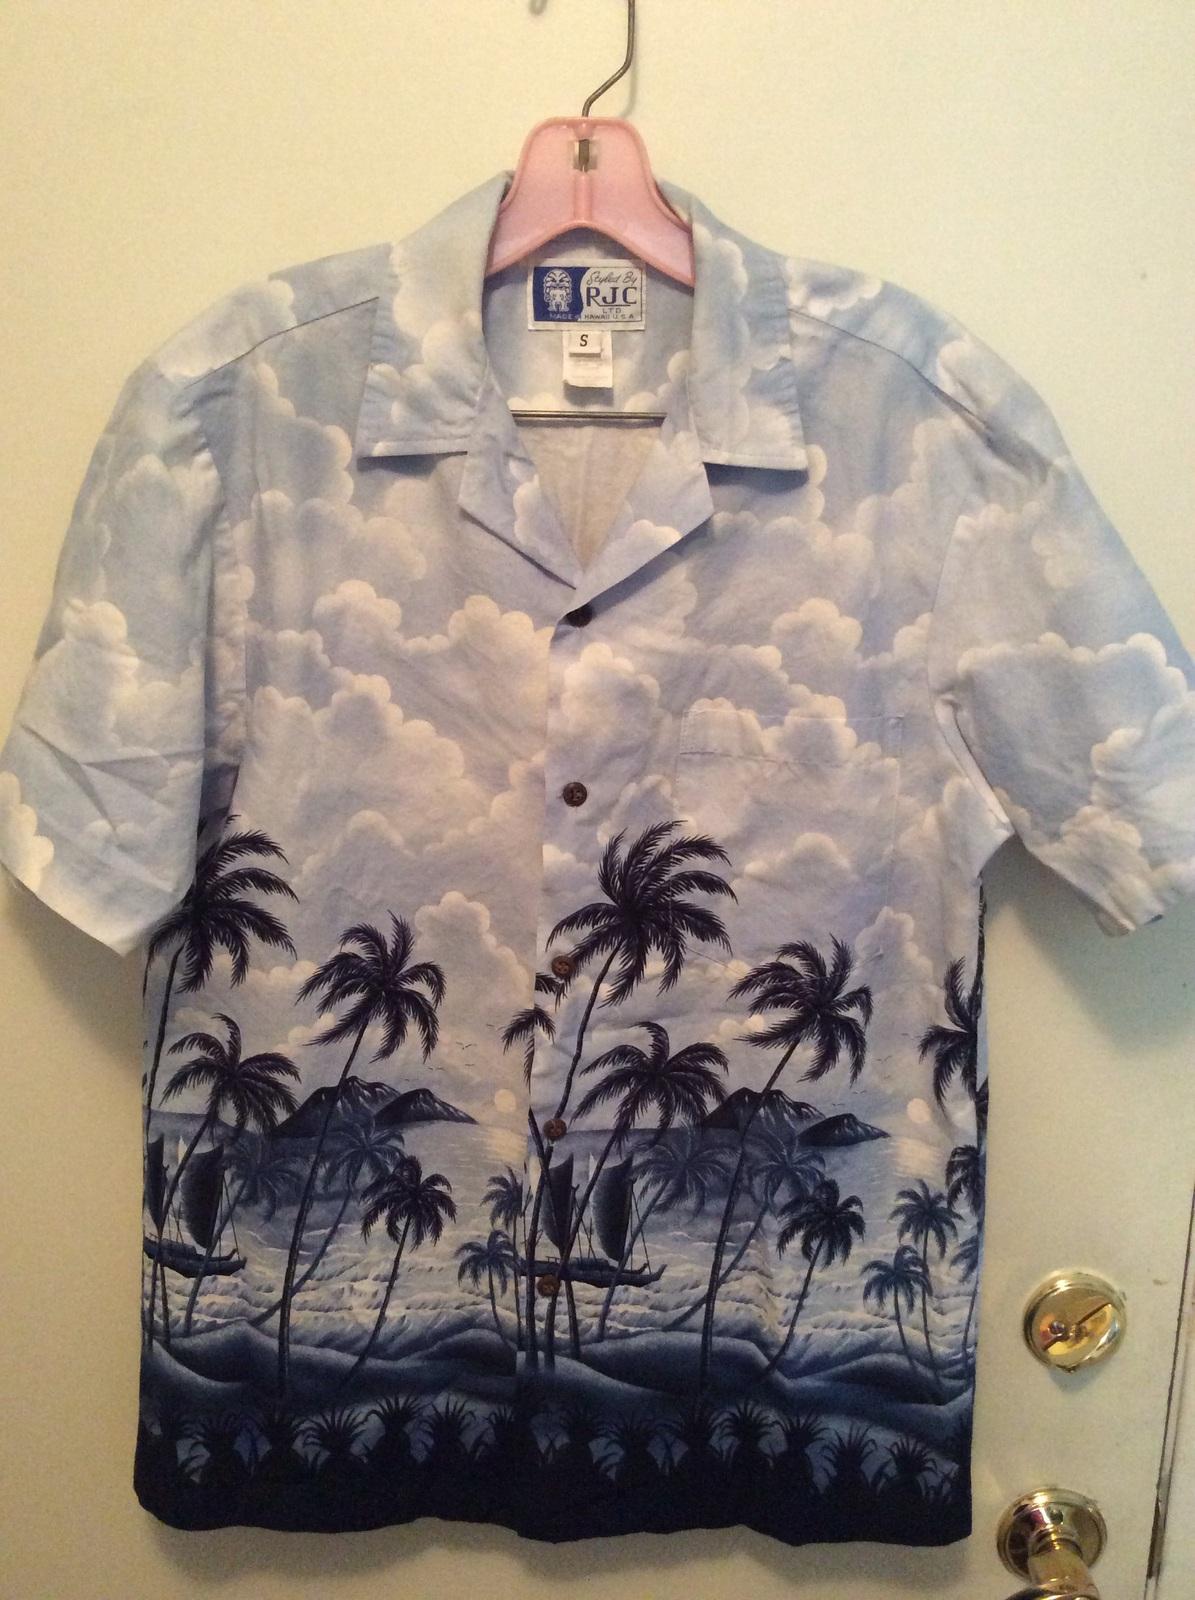 cd498e89 RJC Men's Hawaiian Shirt Blue Small - $21.00